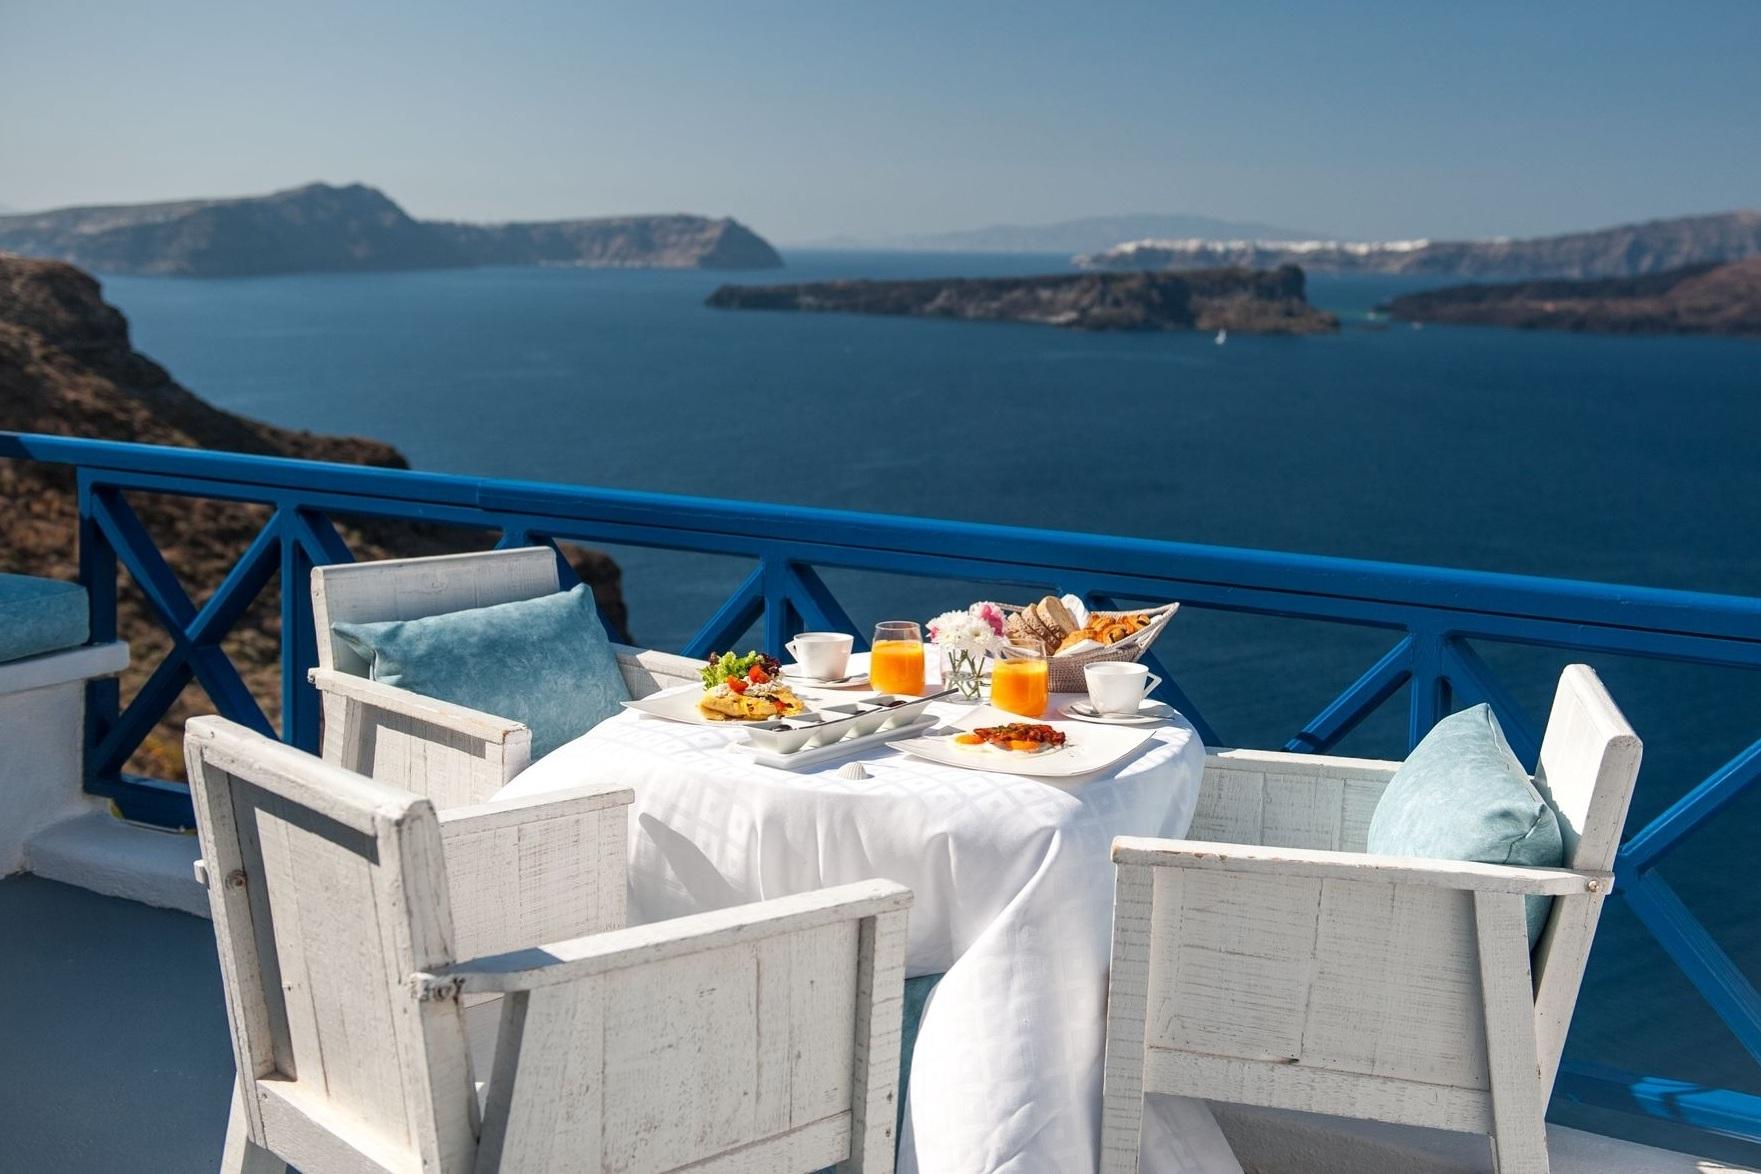 Astarte_Suites_in_Santorini_breakfast_2_2.jpeg